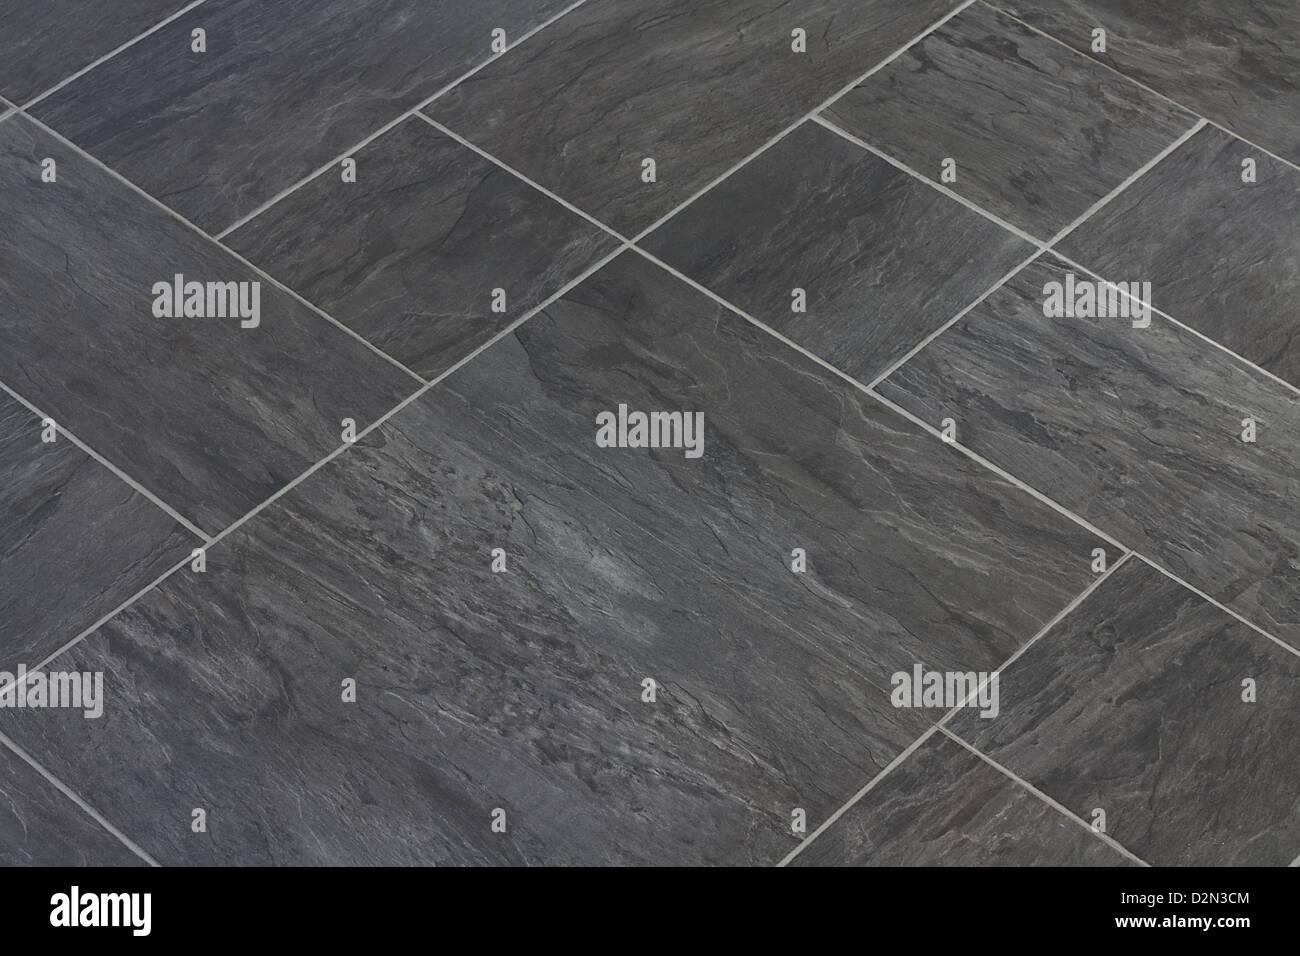 Tiles texture bathroom stockfotos tiles texture bathroom bilder